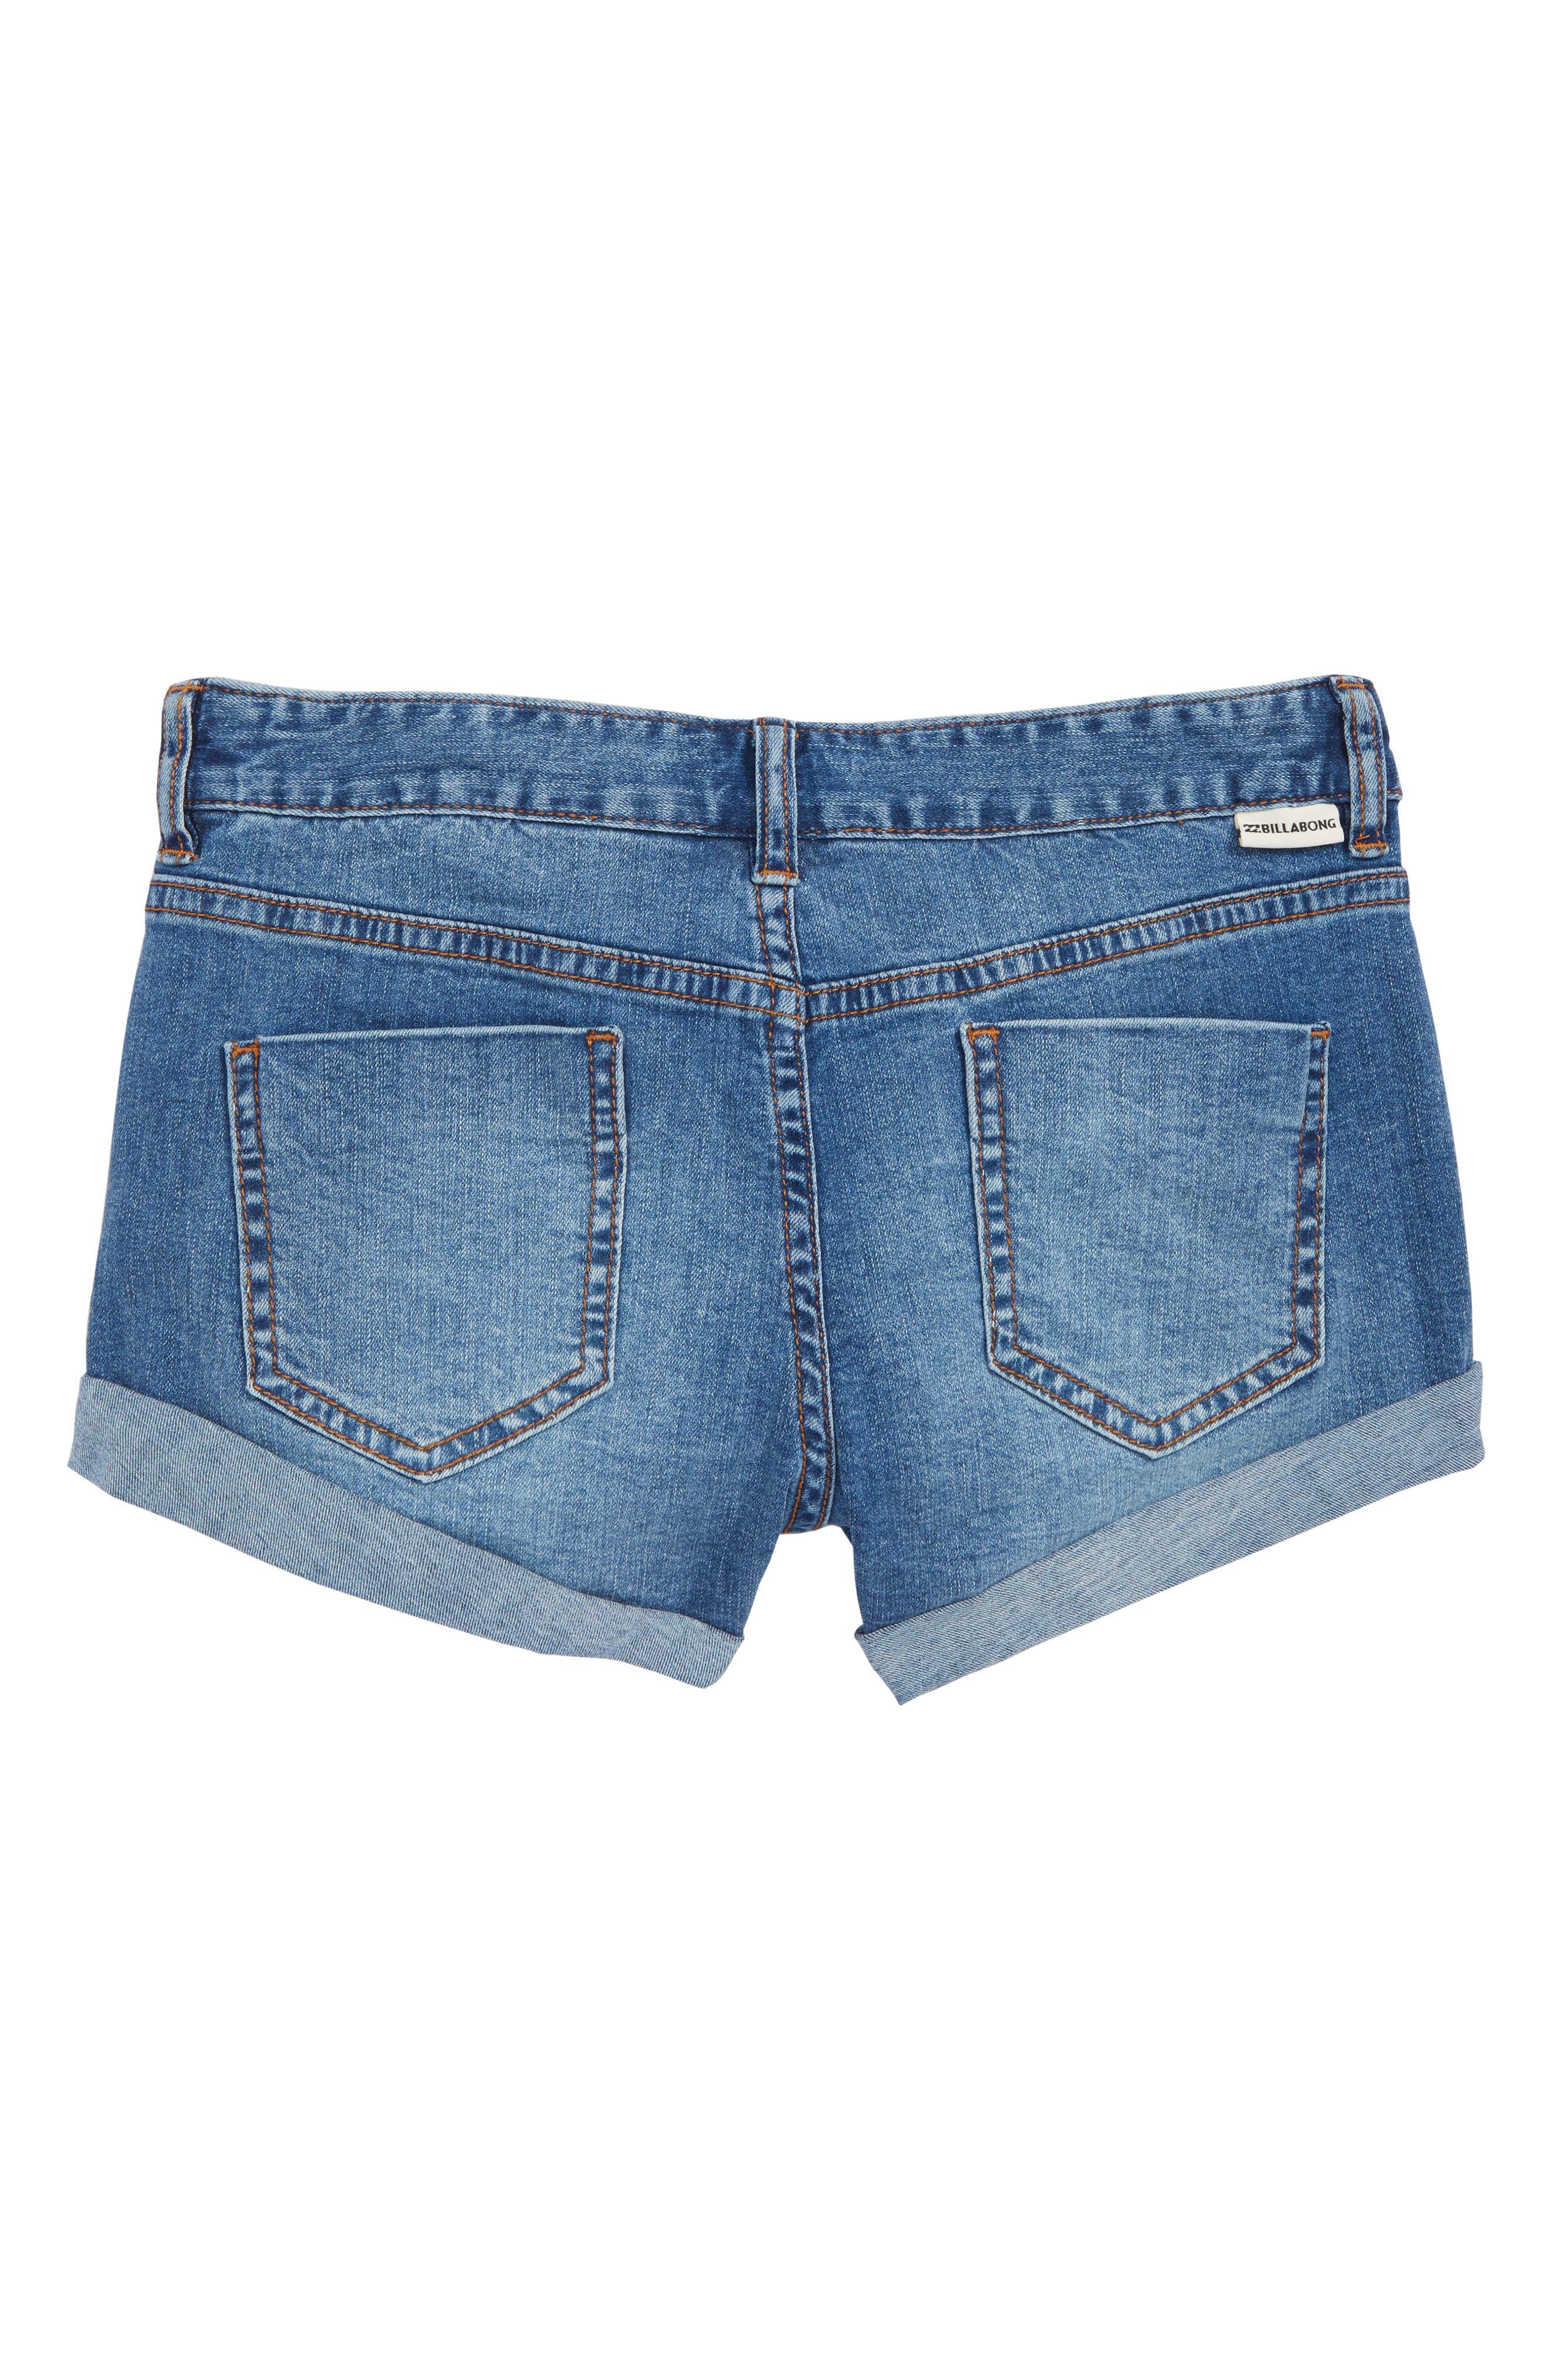 Cool Side Patch Denim Shorts,                             Alternate thumbnail 2, color,                             418